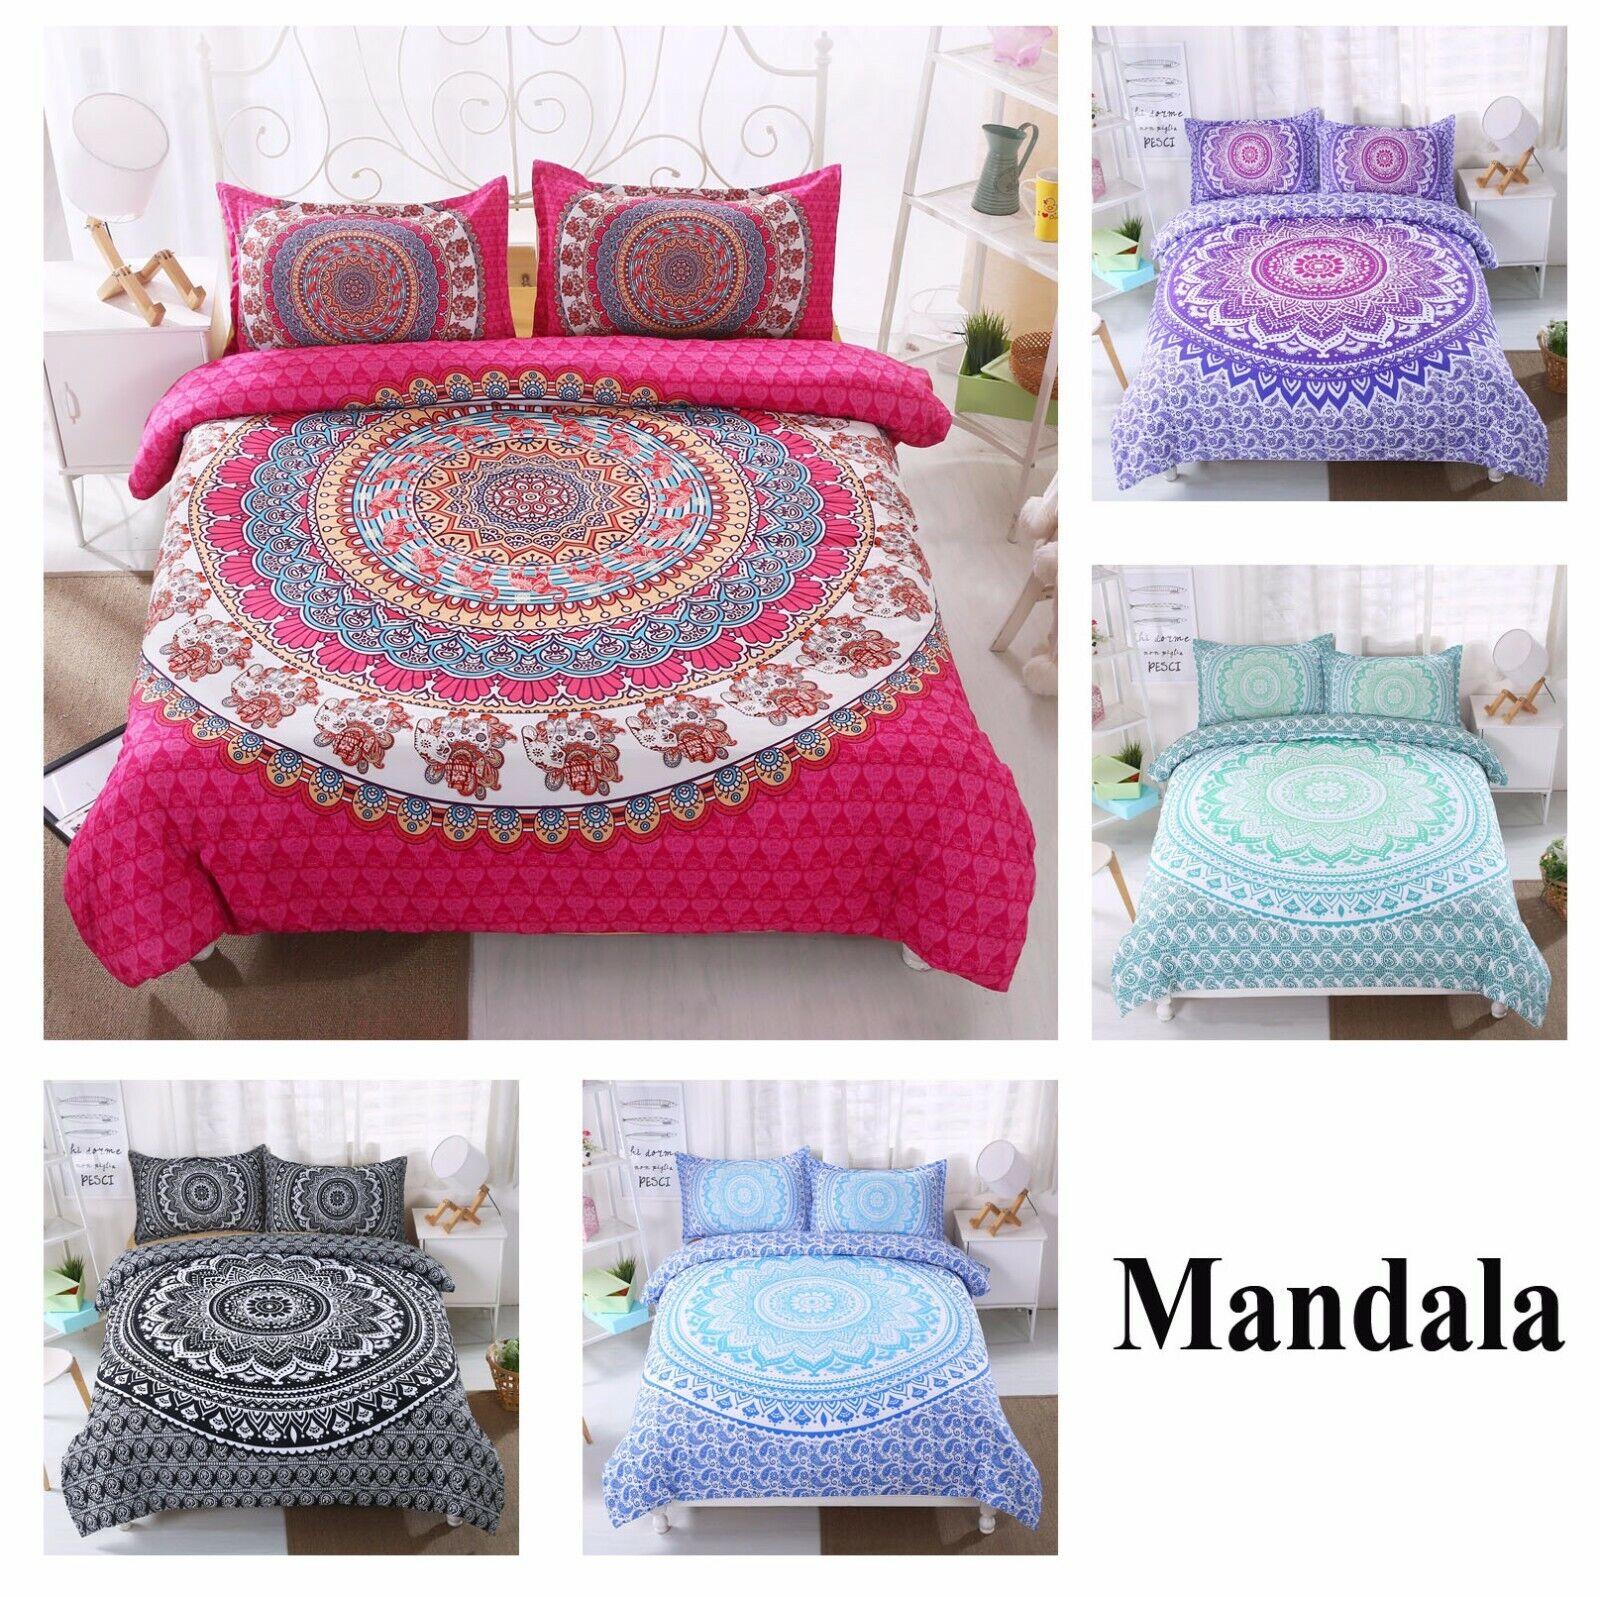 Bohemian Mandala Circles Flower Elephant Bettding Set Duvet Startseite+Pillow Case